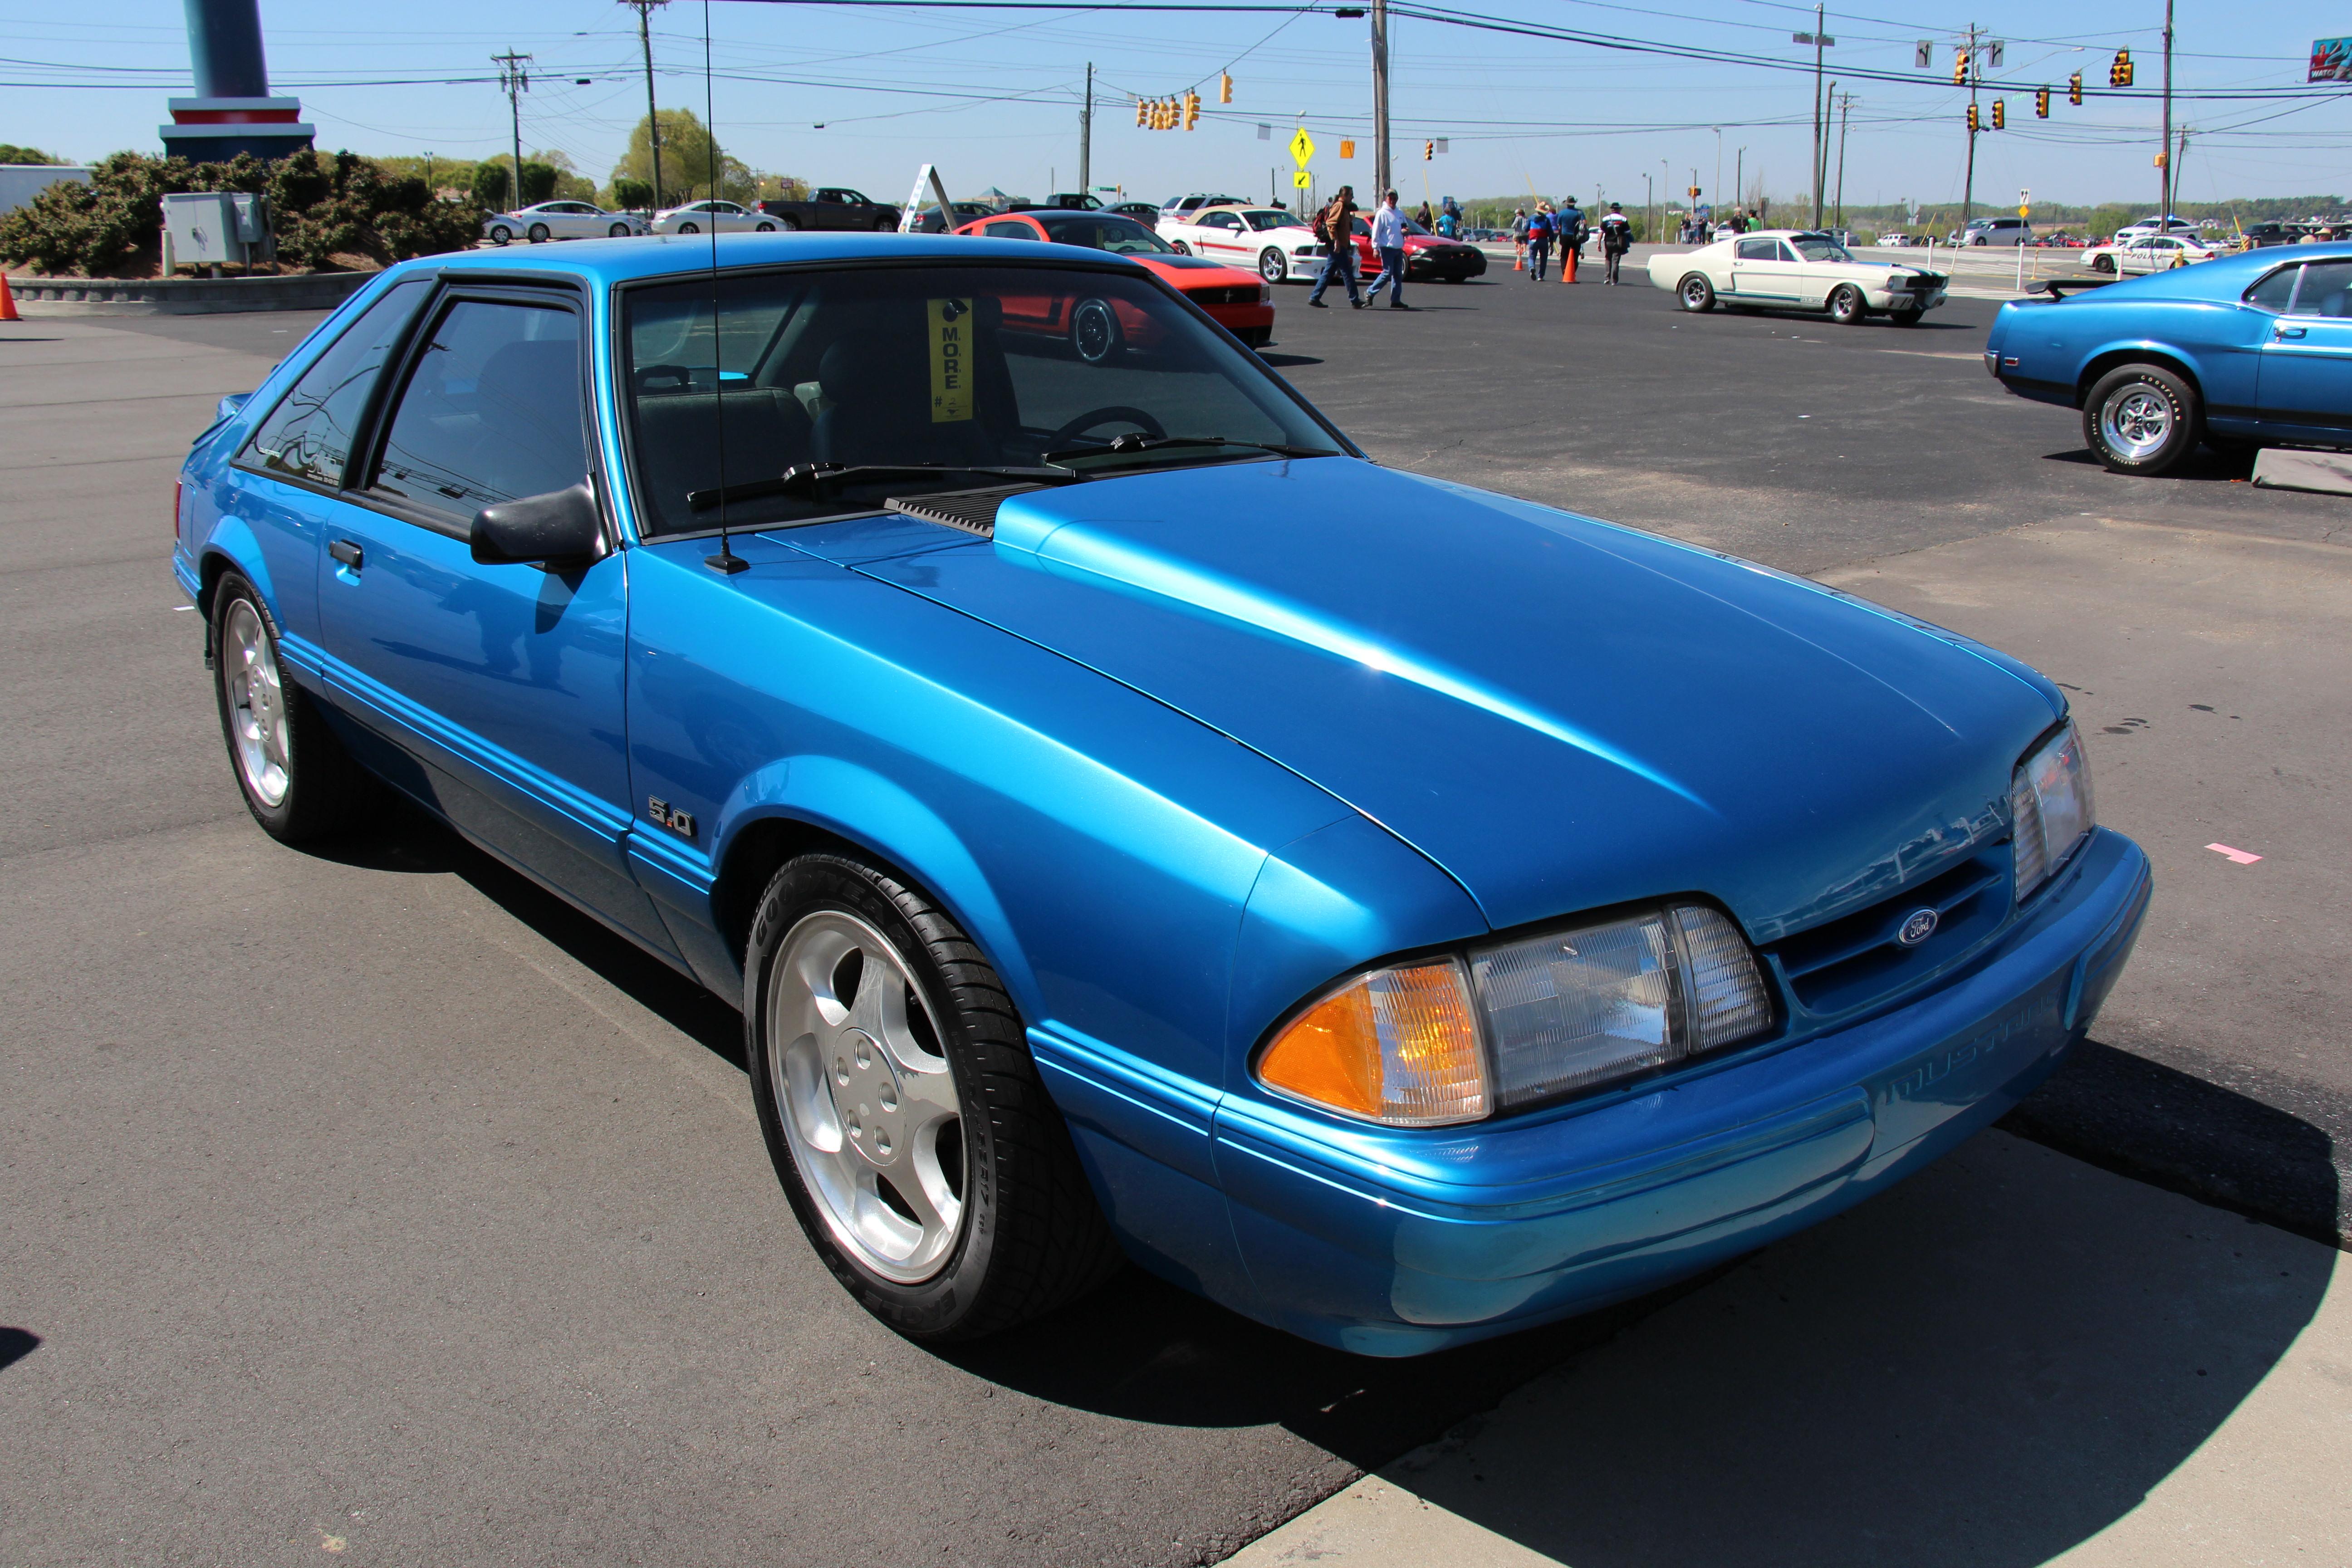 1993 ford mustang lx hatchback image